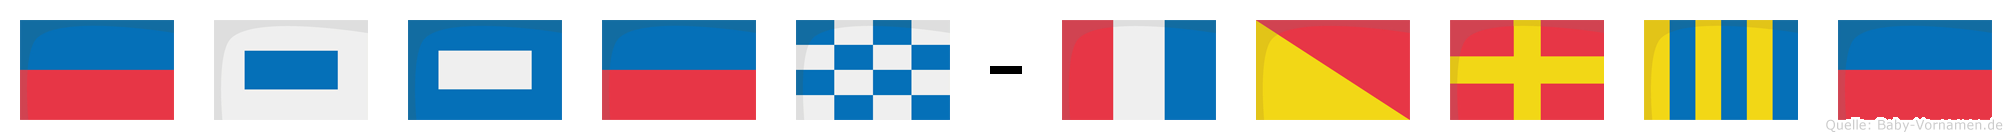 Espen-Torge im Flaggenalphabet